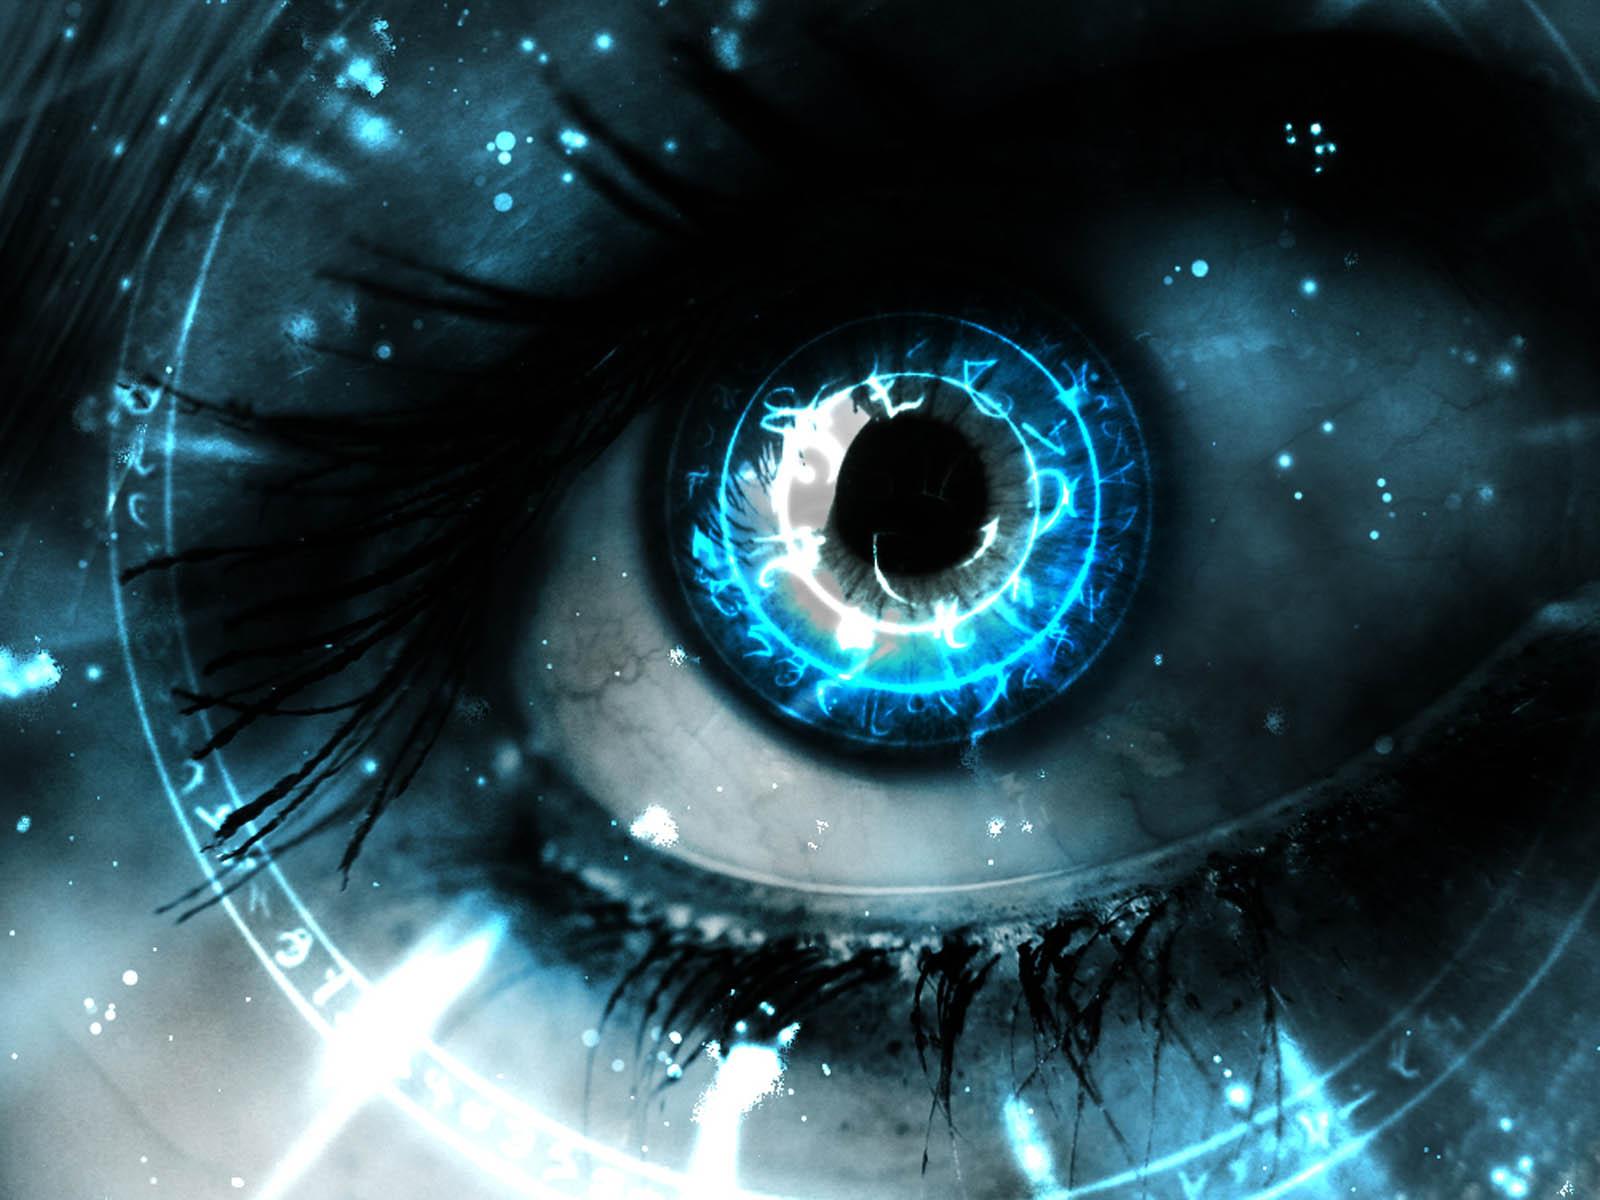 the 3d eye wallpapers 3d eye desktop wallpapers 3d eye desktop